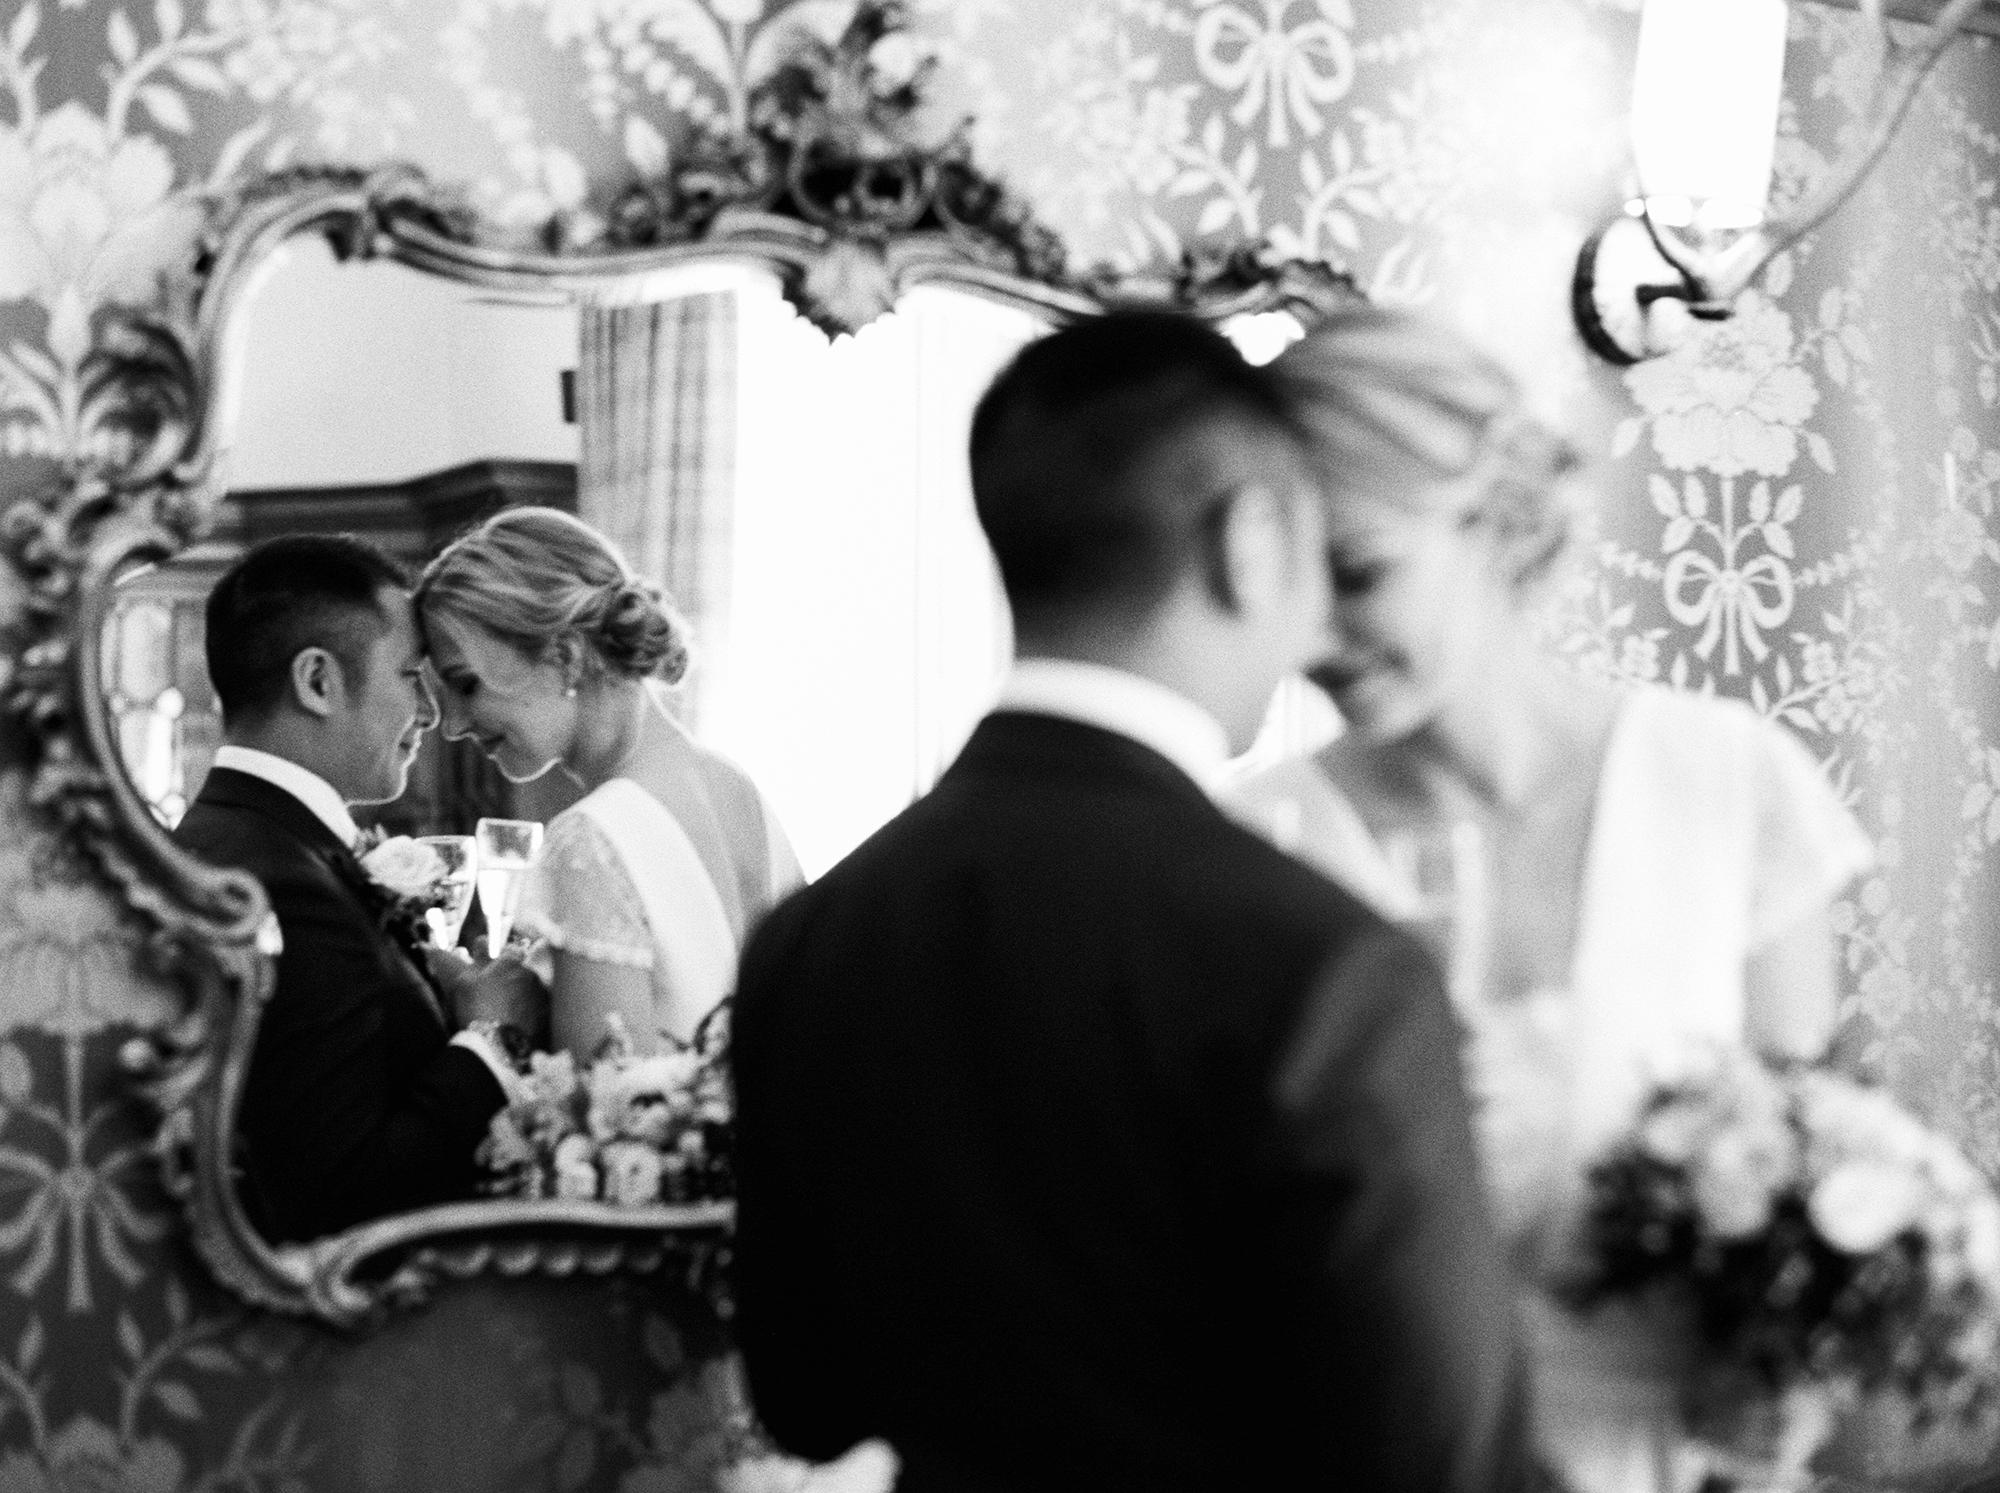 wedding_photographer_cumbria001.jpg